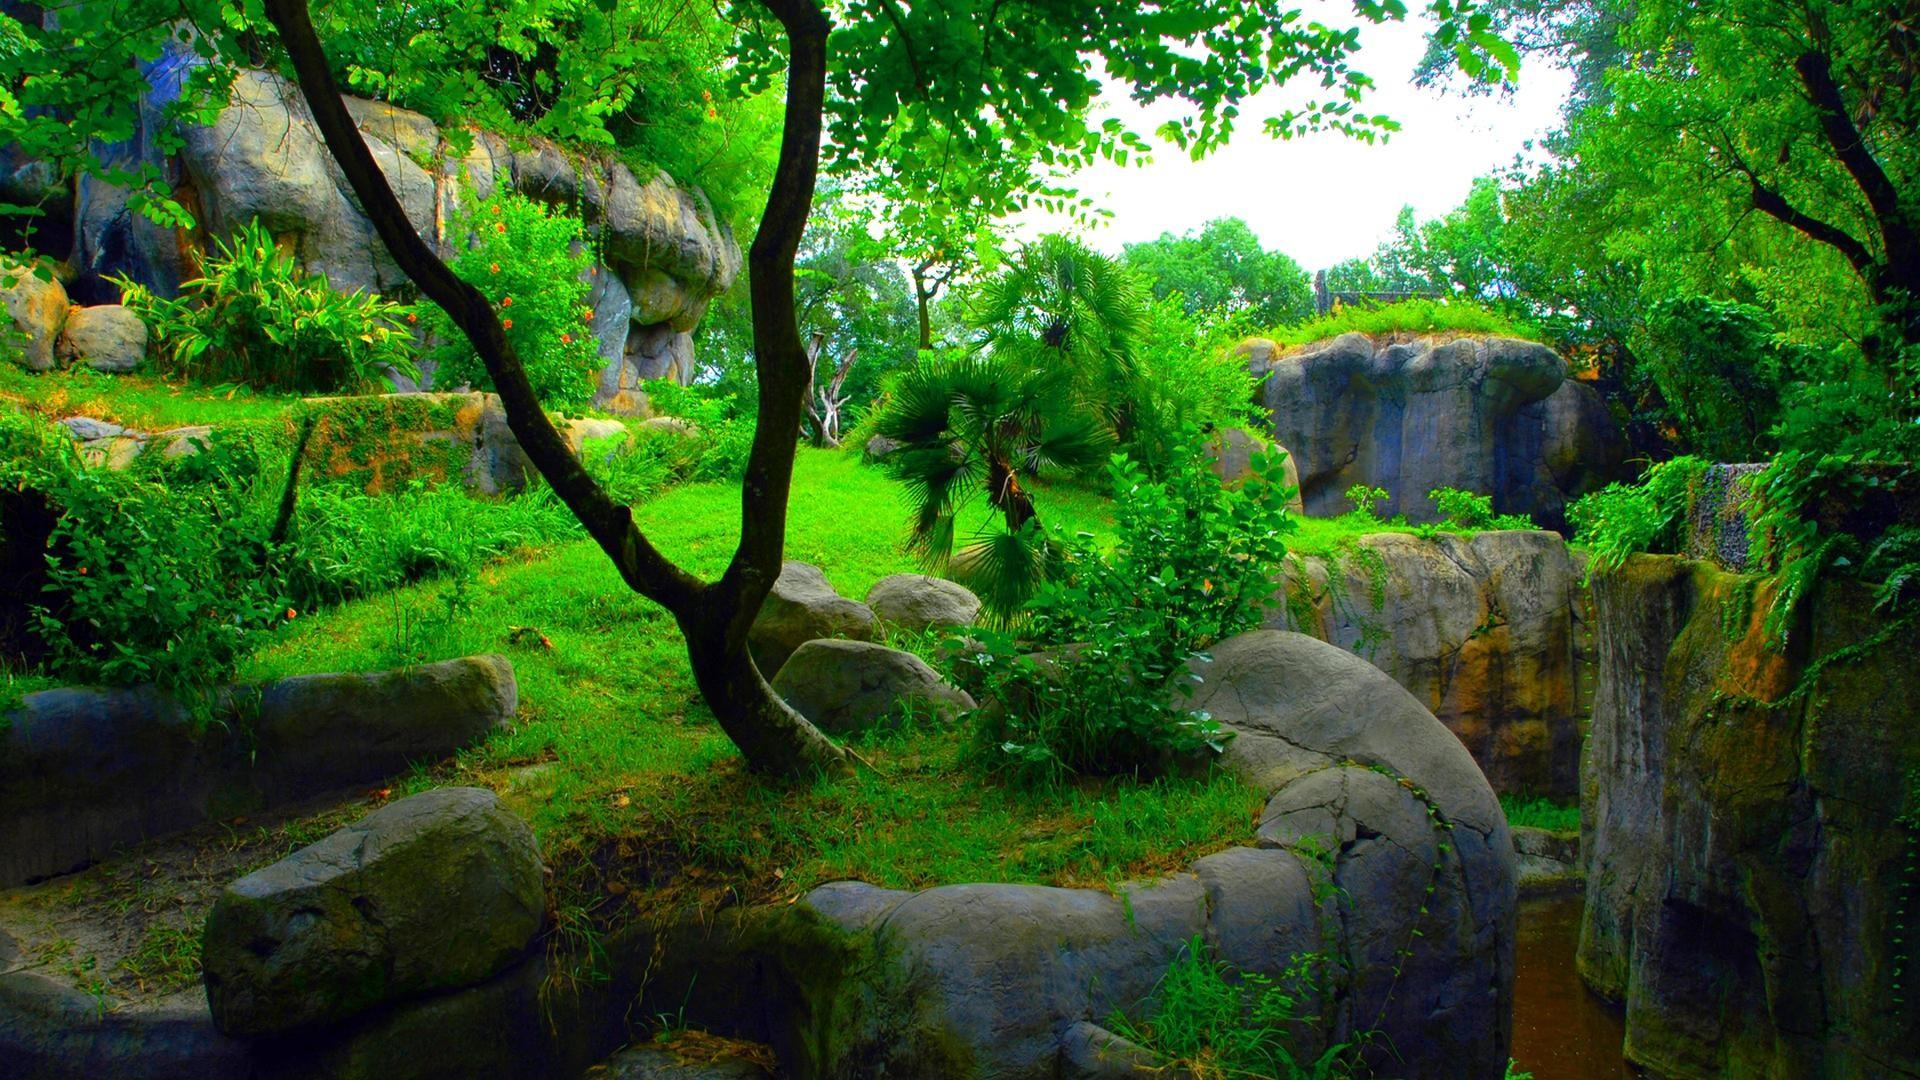 nature wallpaper hd 3d,nature,natural landscape,vegetation,tree,green